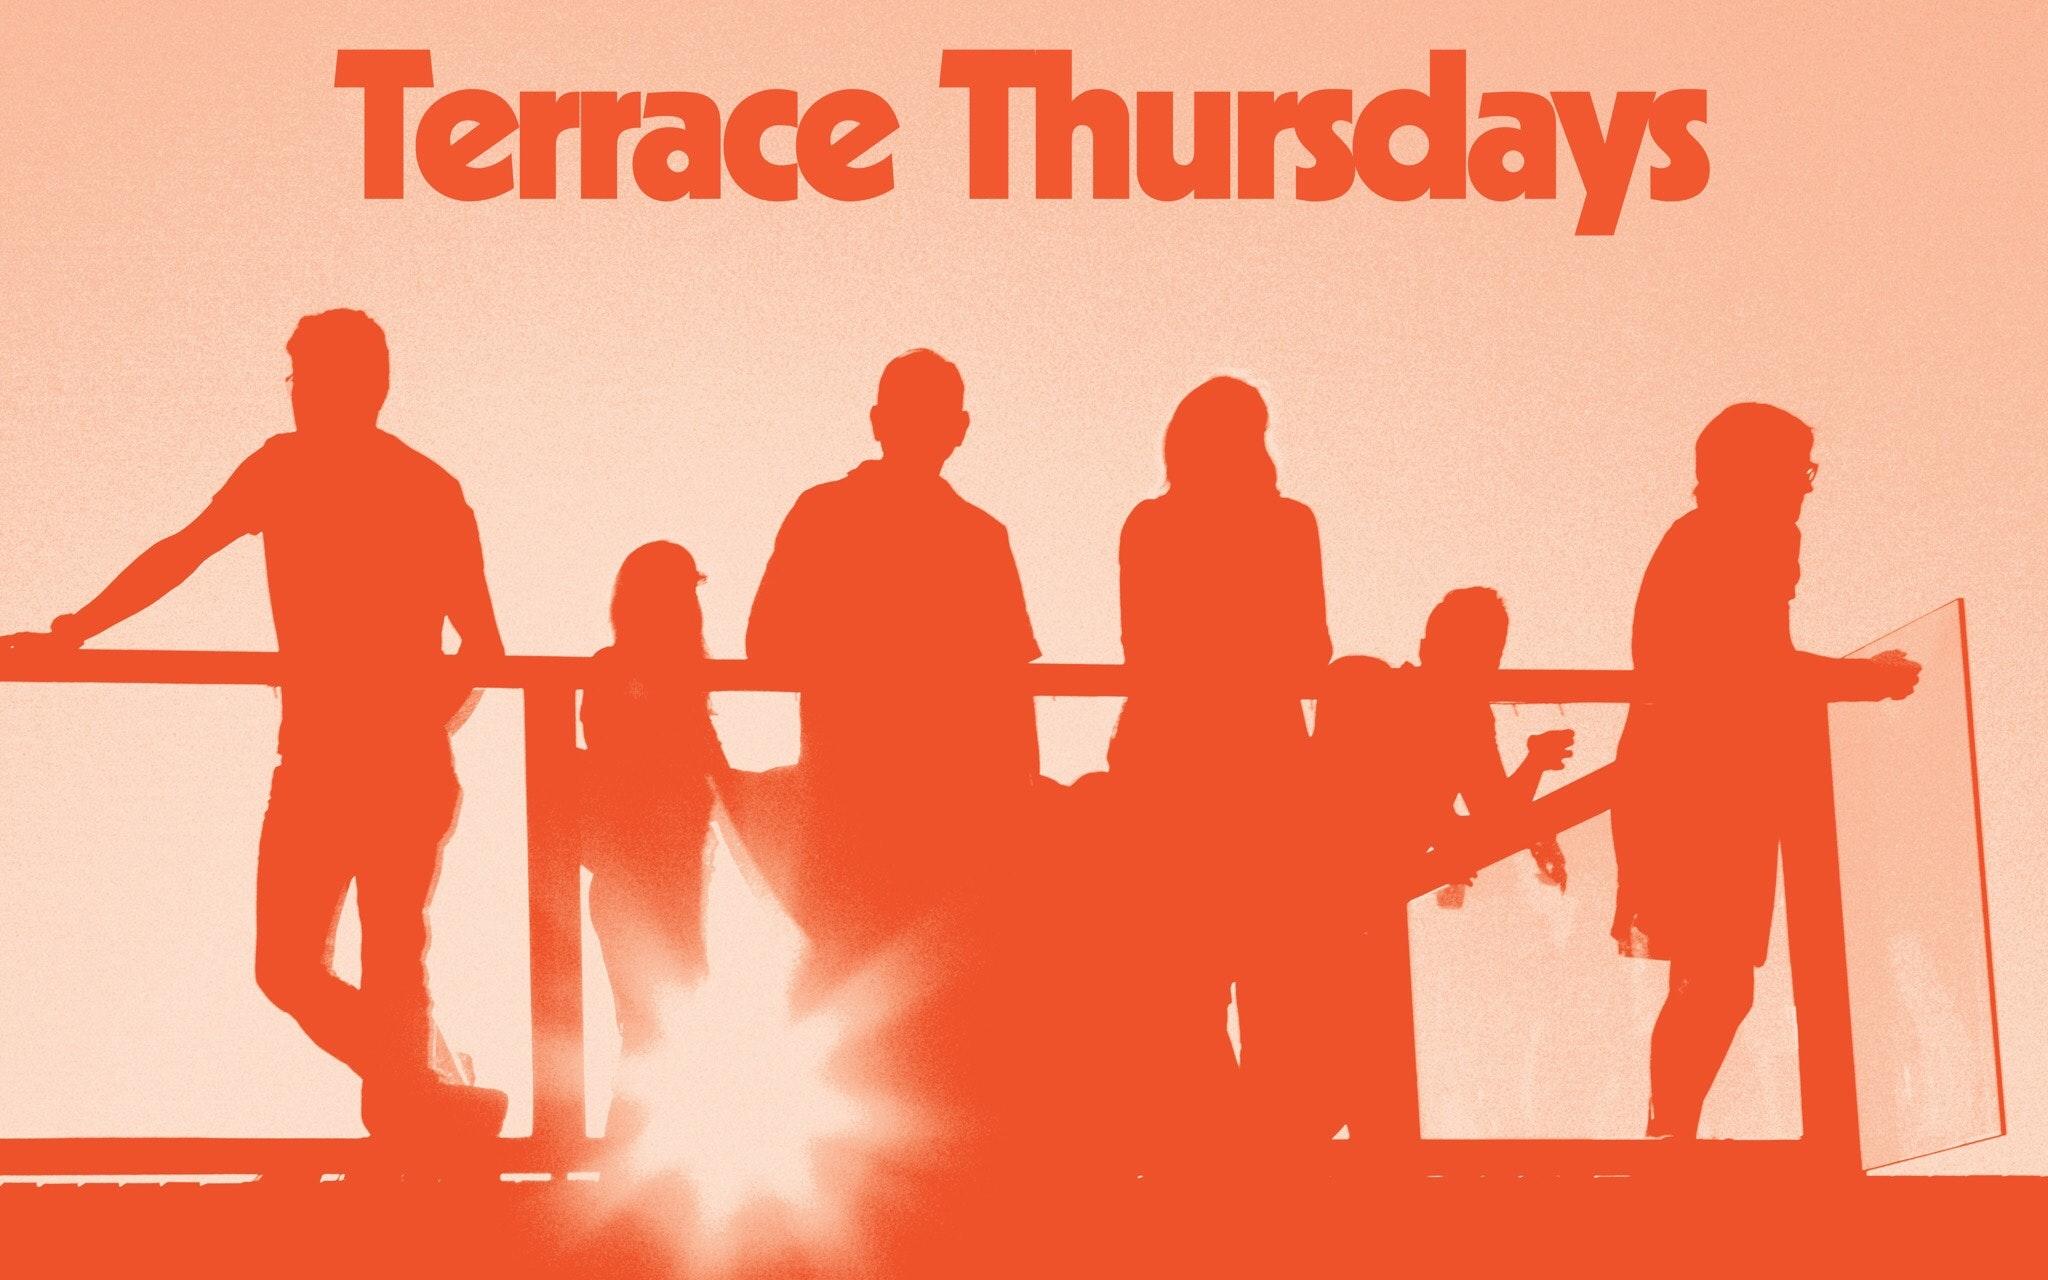 Terrace Thursdays